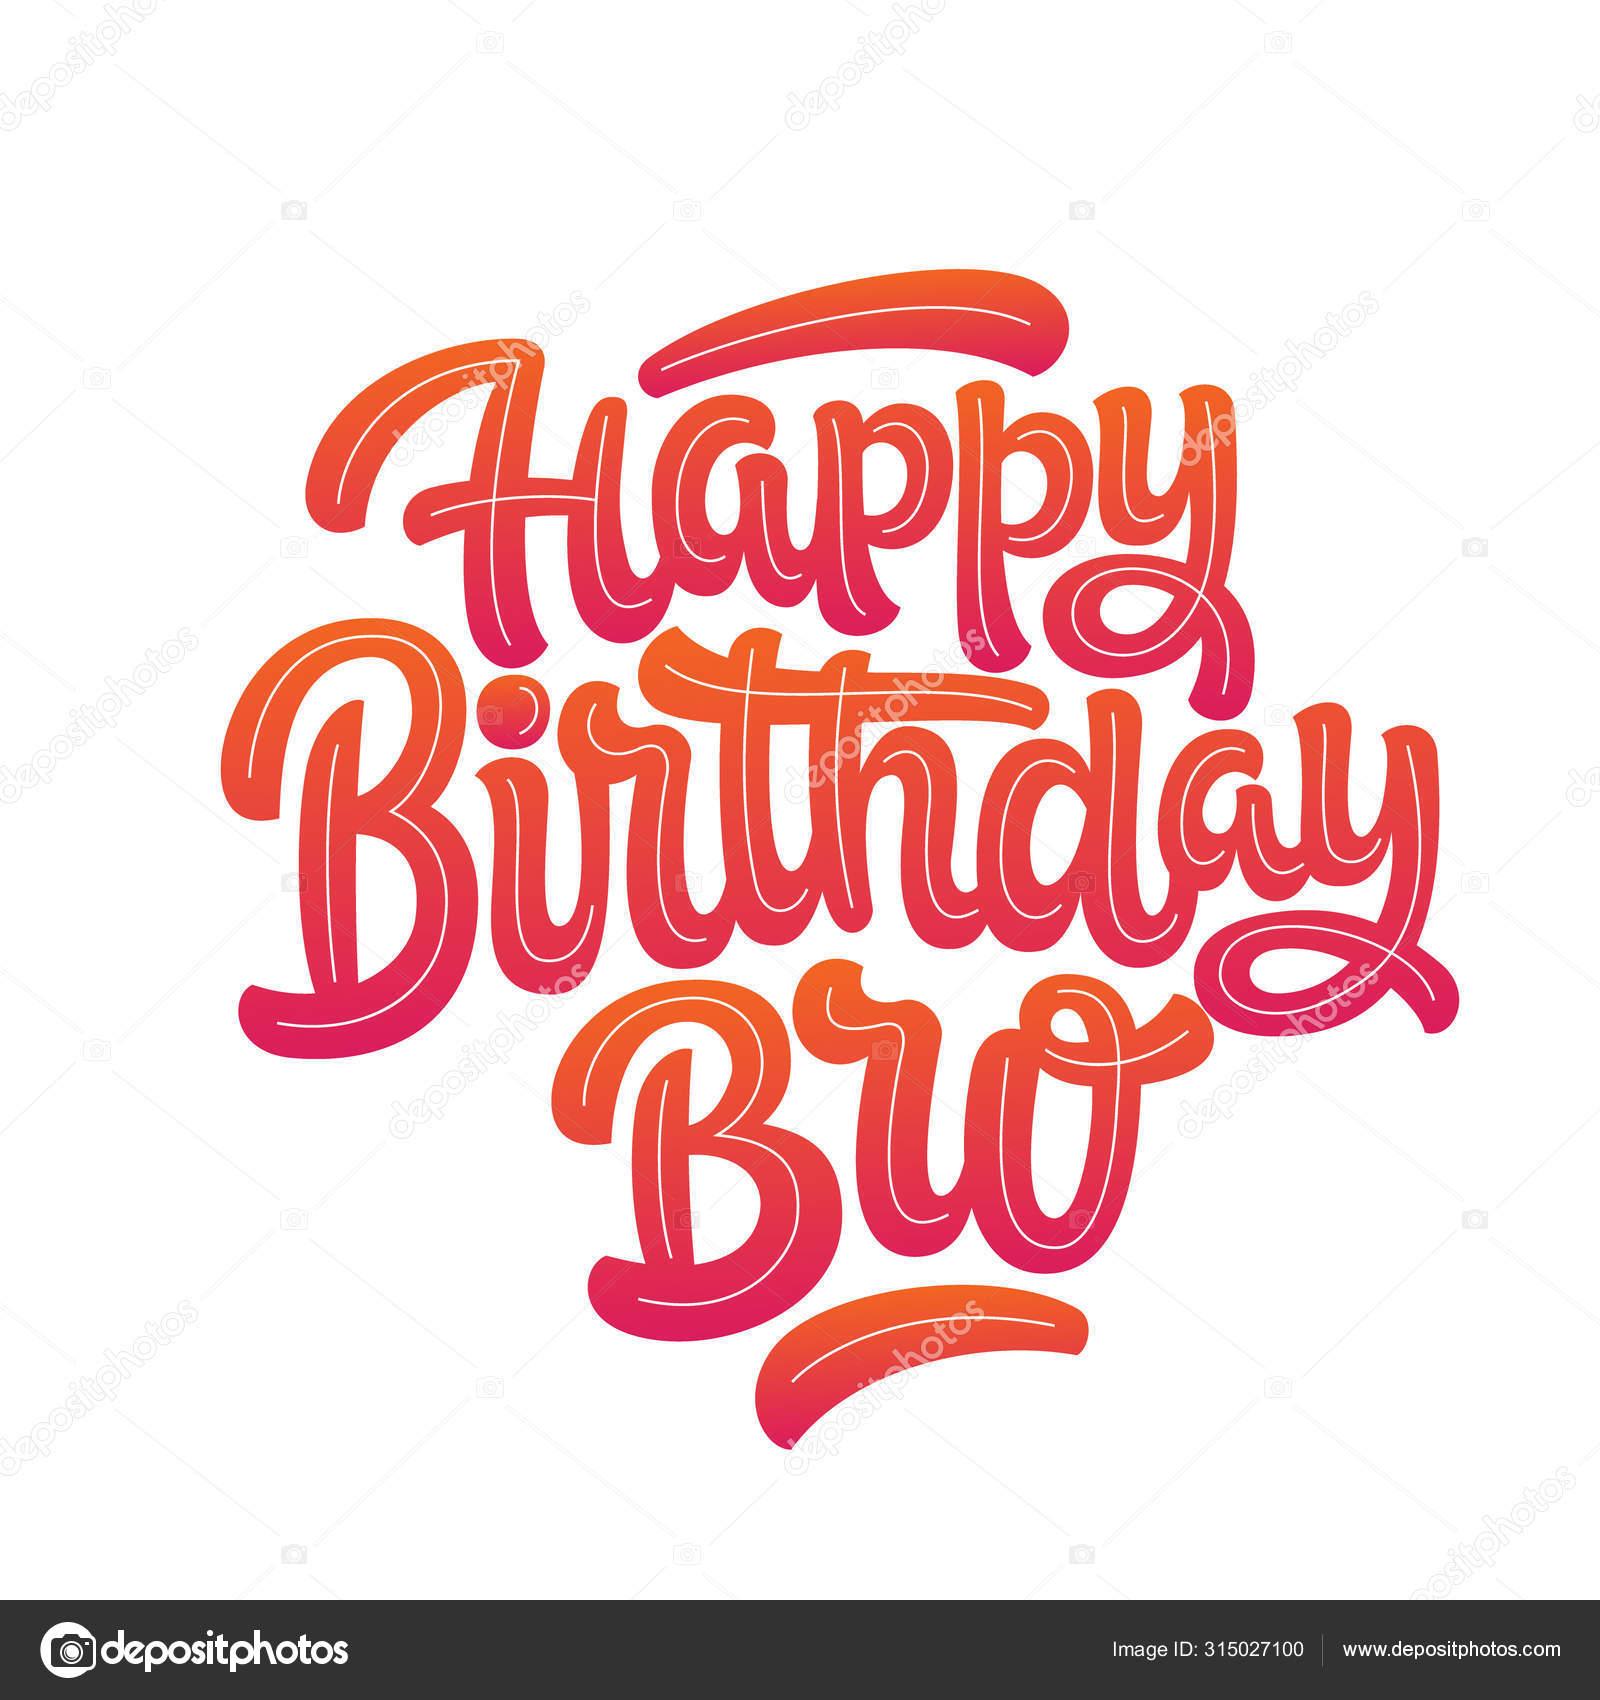 91 Happy Birthday Bro Vector Images Free Royalty Free Happy Birthday Bro Vectors Depositphotos